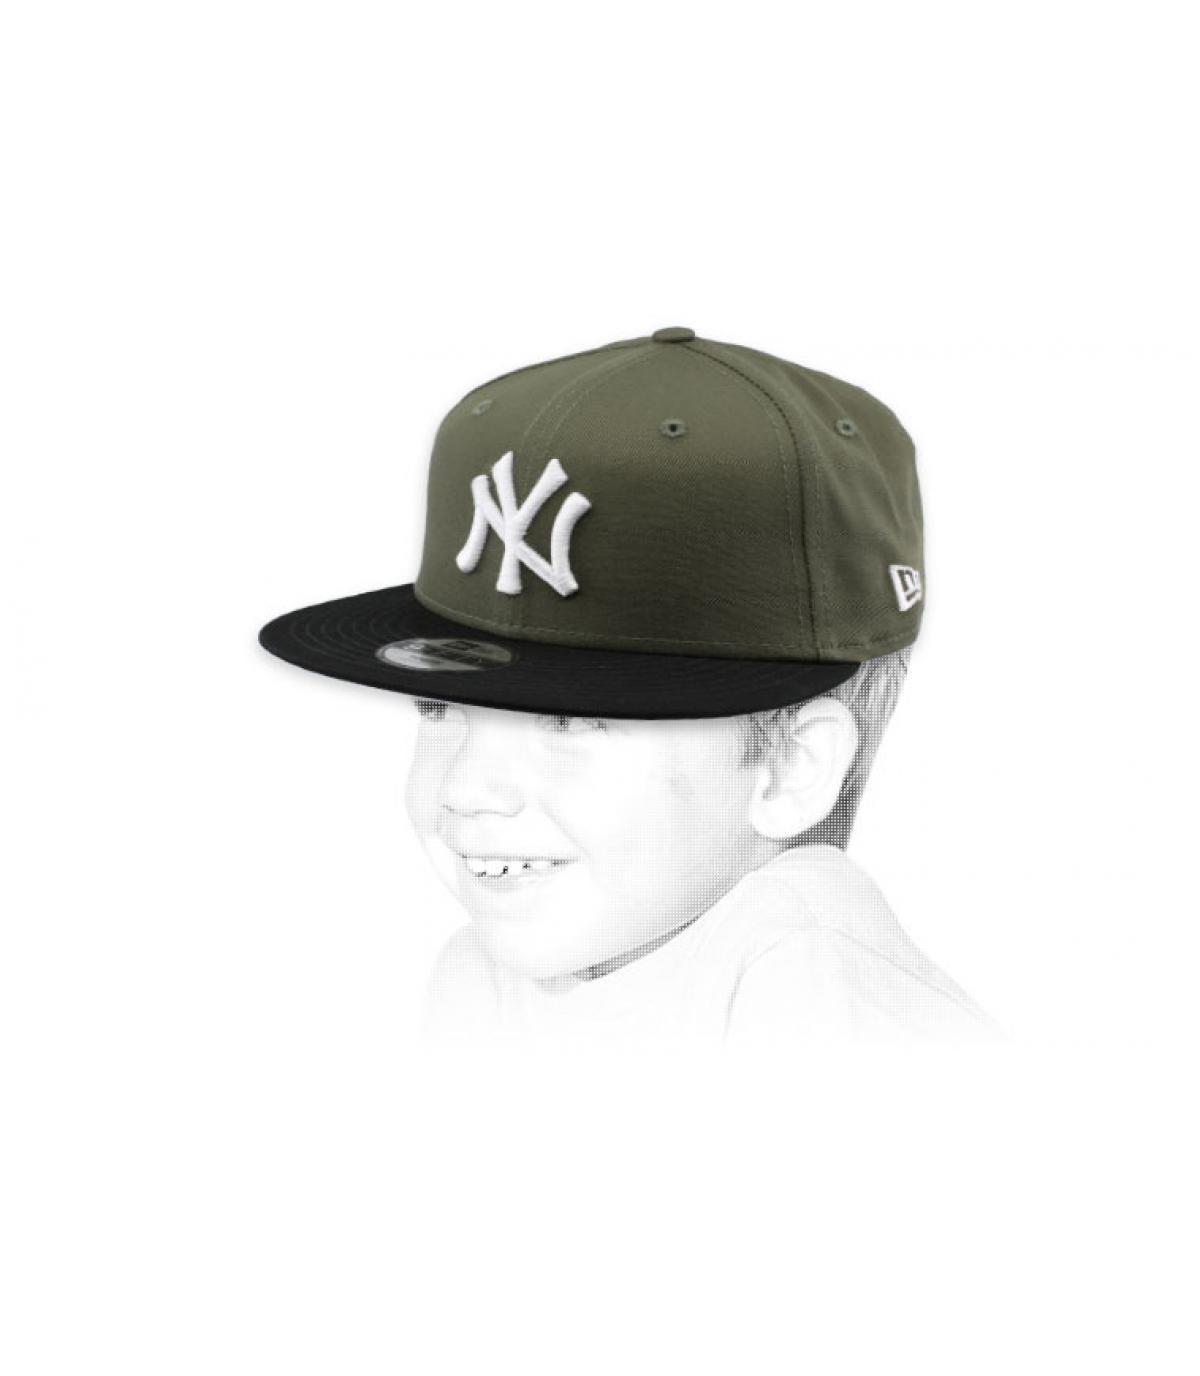 gorra niño NY verde negro